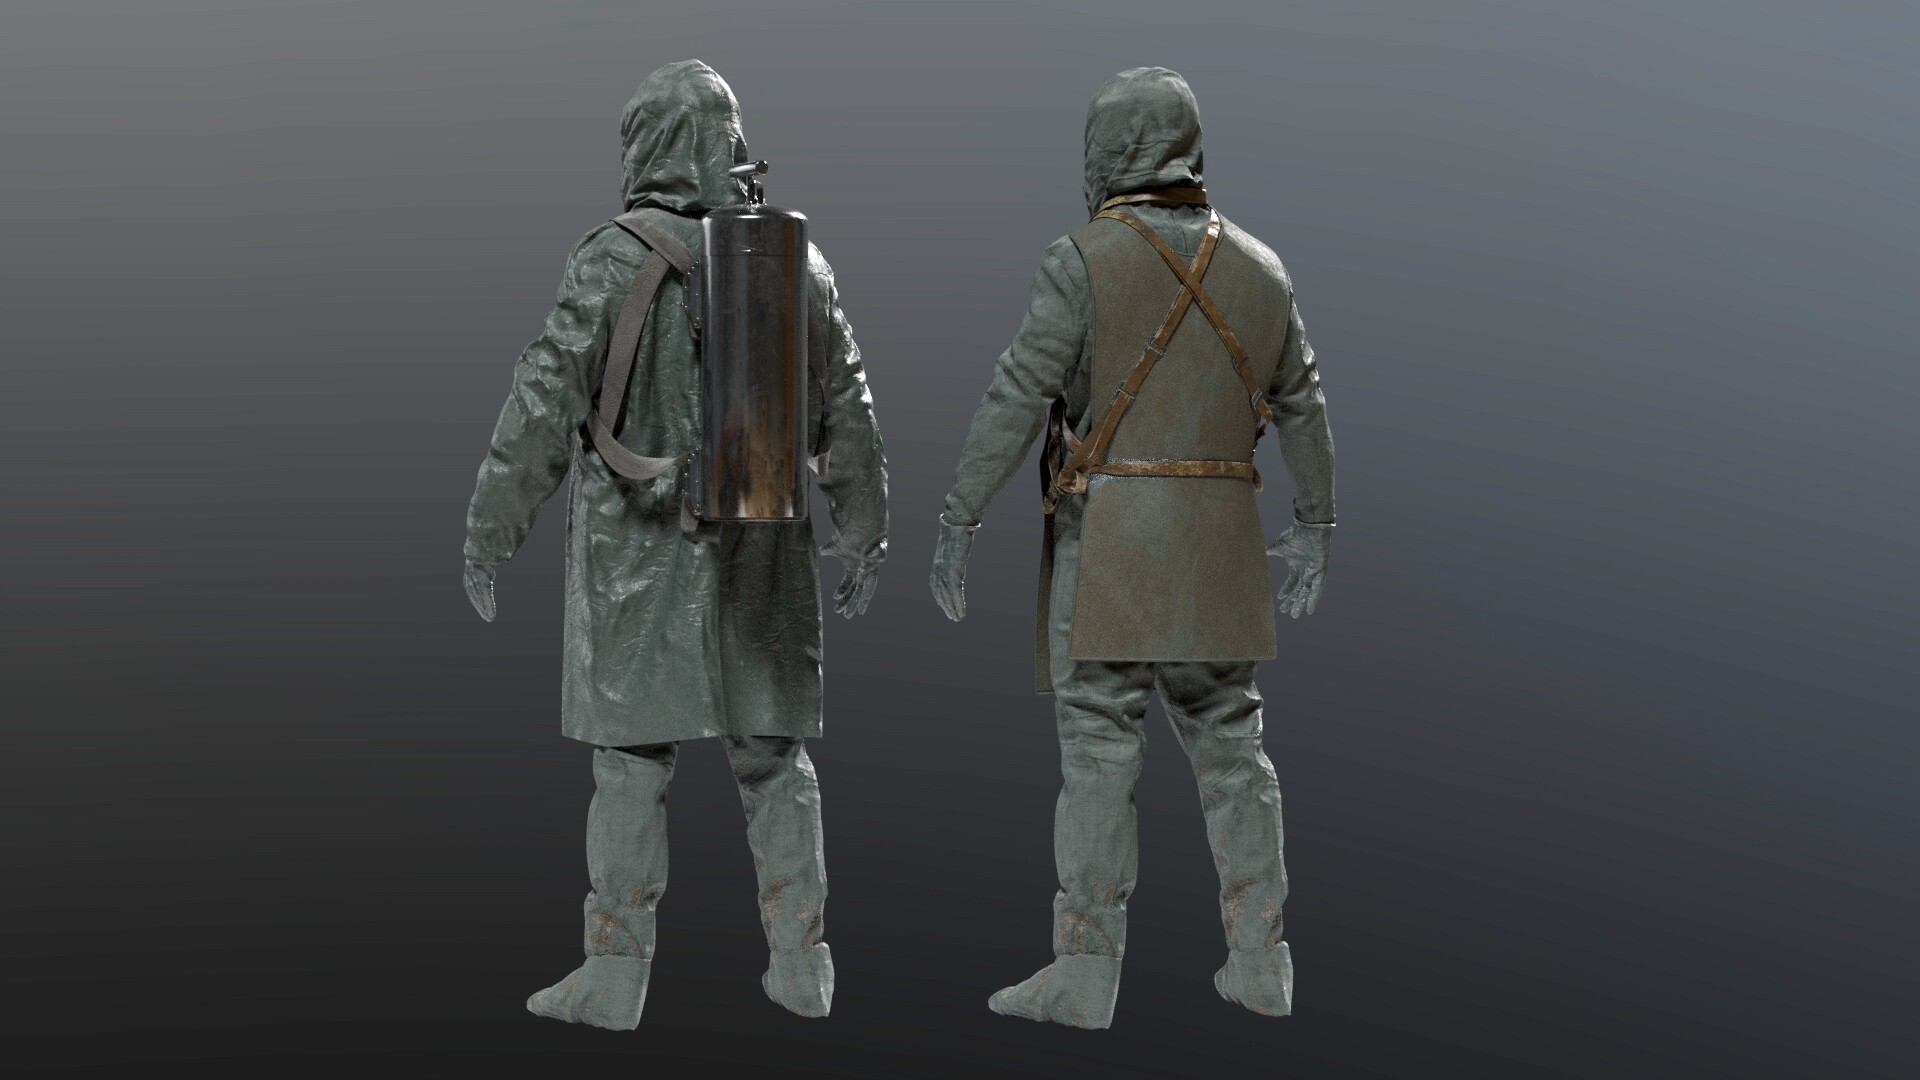 Artstation Chernobyl Liquidator Suit Albin Merle